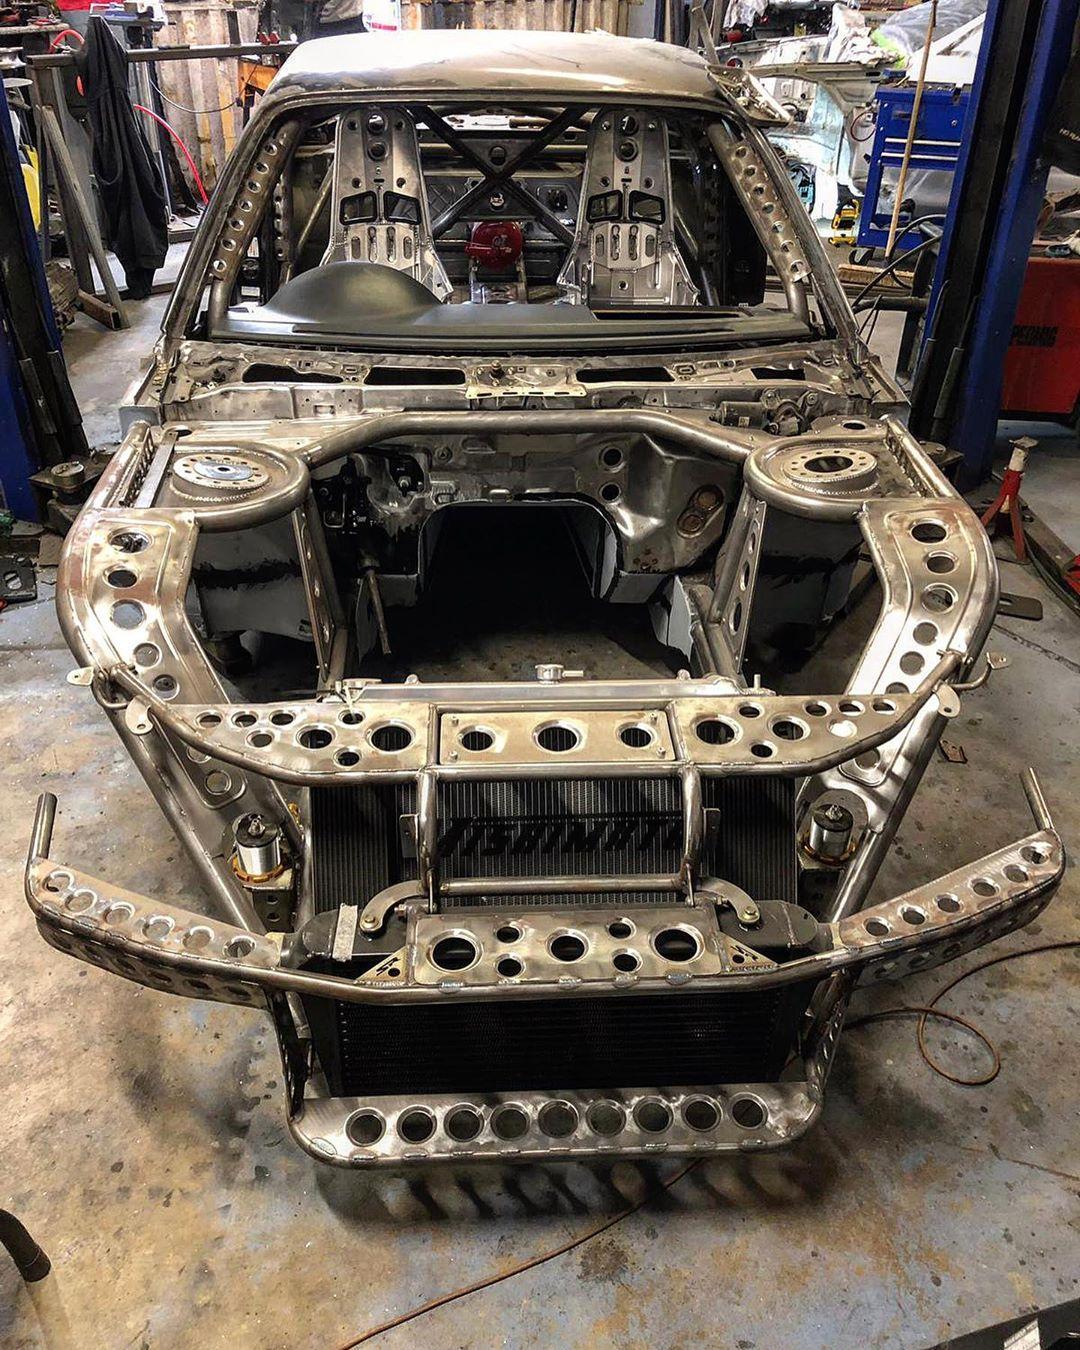 ▪️ ▪️ ▪️ ▪️ ▪️ ▪️ ▪️ ▪️ ▪️ ▪️ sr, Nissan, s15, silvia, silvias15, s15silvia, sr20det, welding, 240sx, speedhunters, sbody, schassis, stance, stancenation, fitteduk, fabrication, slammed, fabwork, 200sx, s13, s14, s14a, SR20, silvianation, sxoc, paintwork, drift, drifting, driftcar, showcar